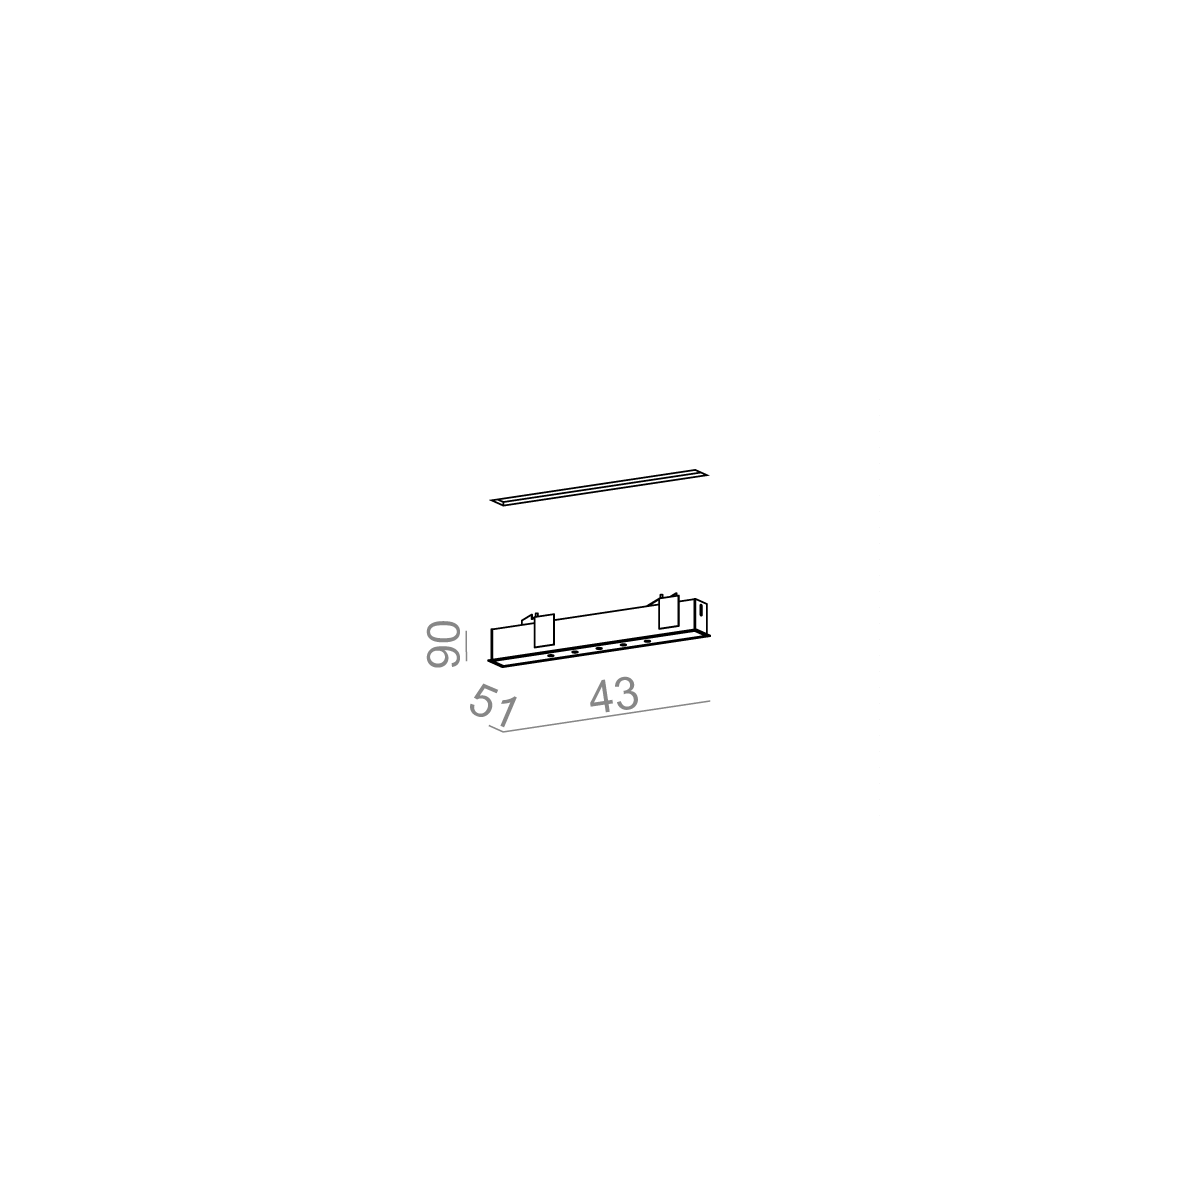 AQFORM LENS LINE 43 LED wpuszczana LL0013